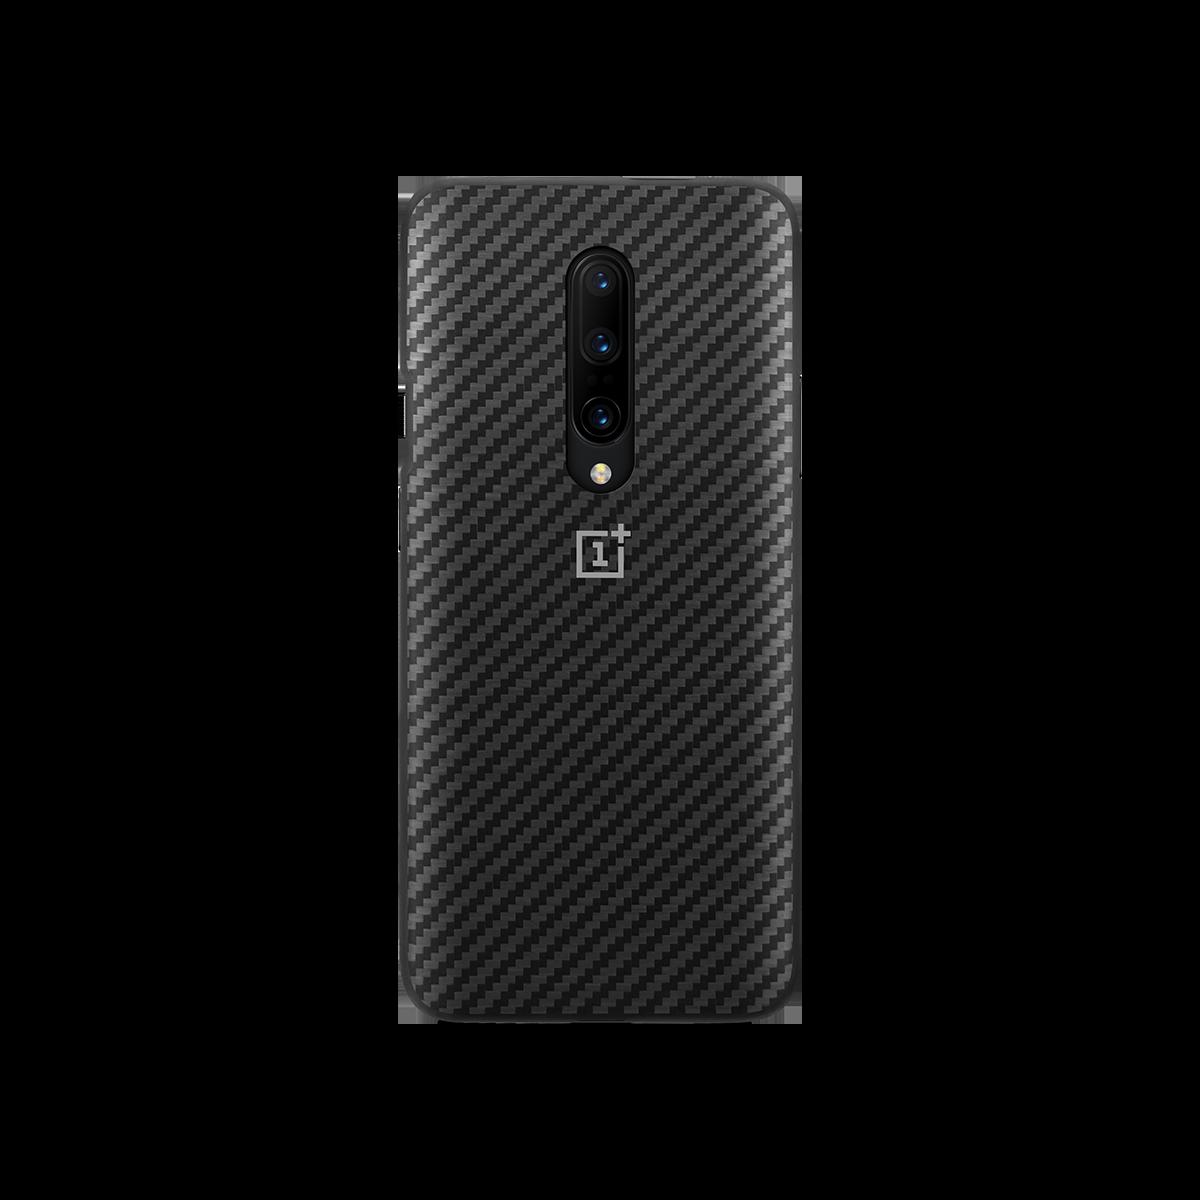 OnePlus Bumper Case Karbon do OnePlus 7 Pro